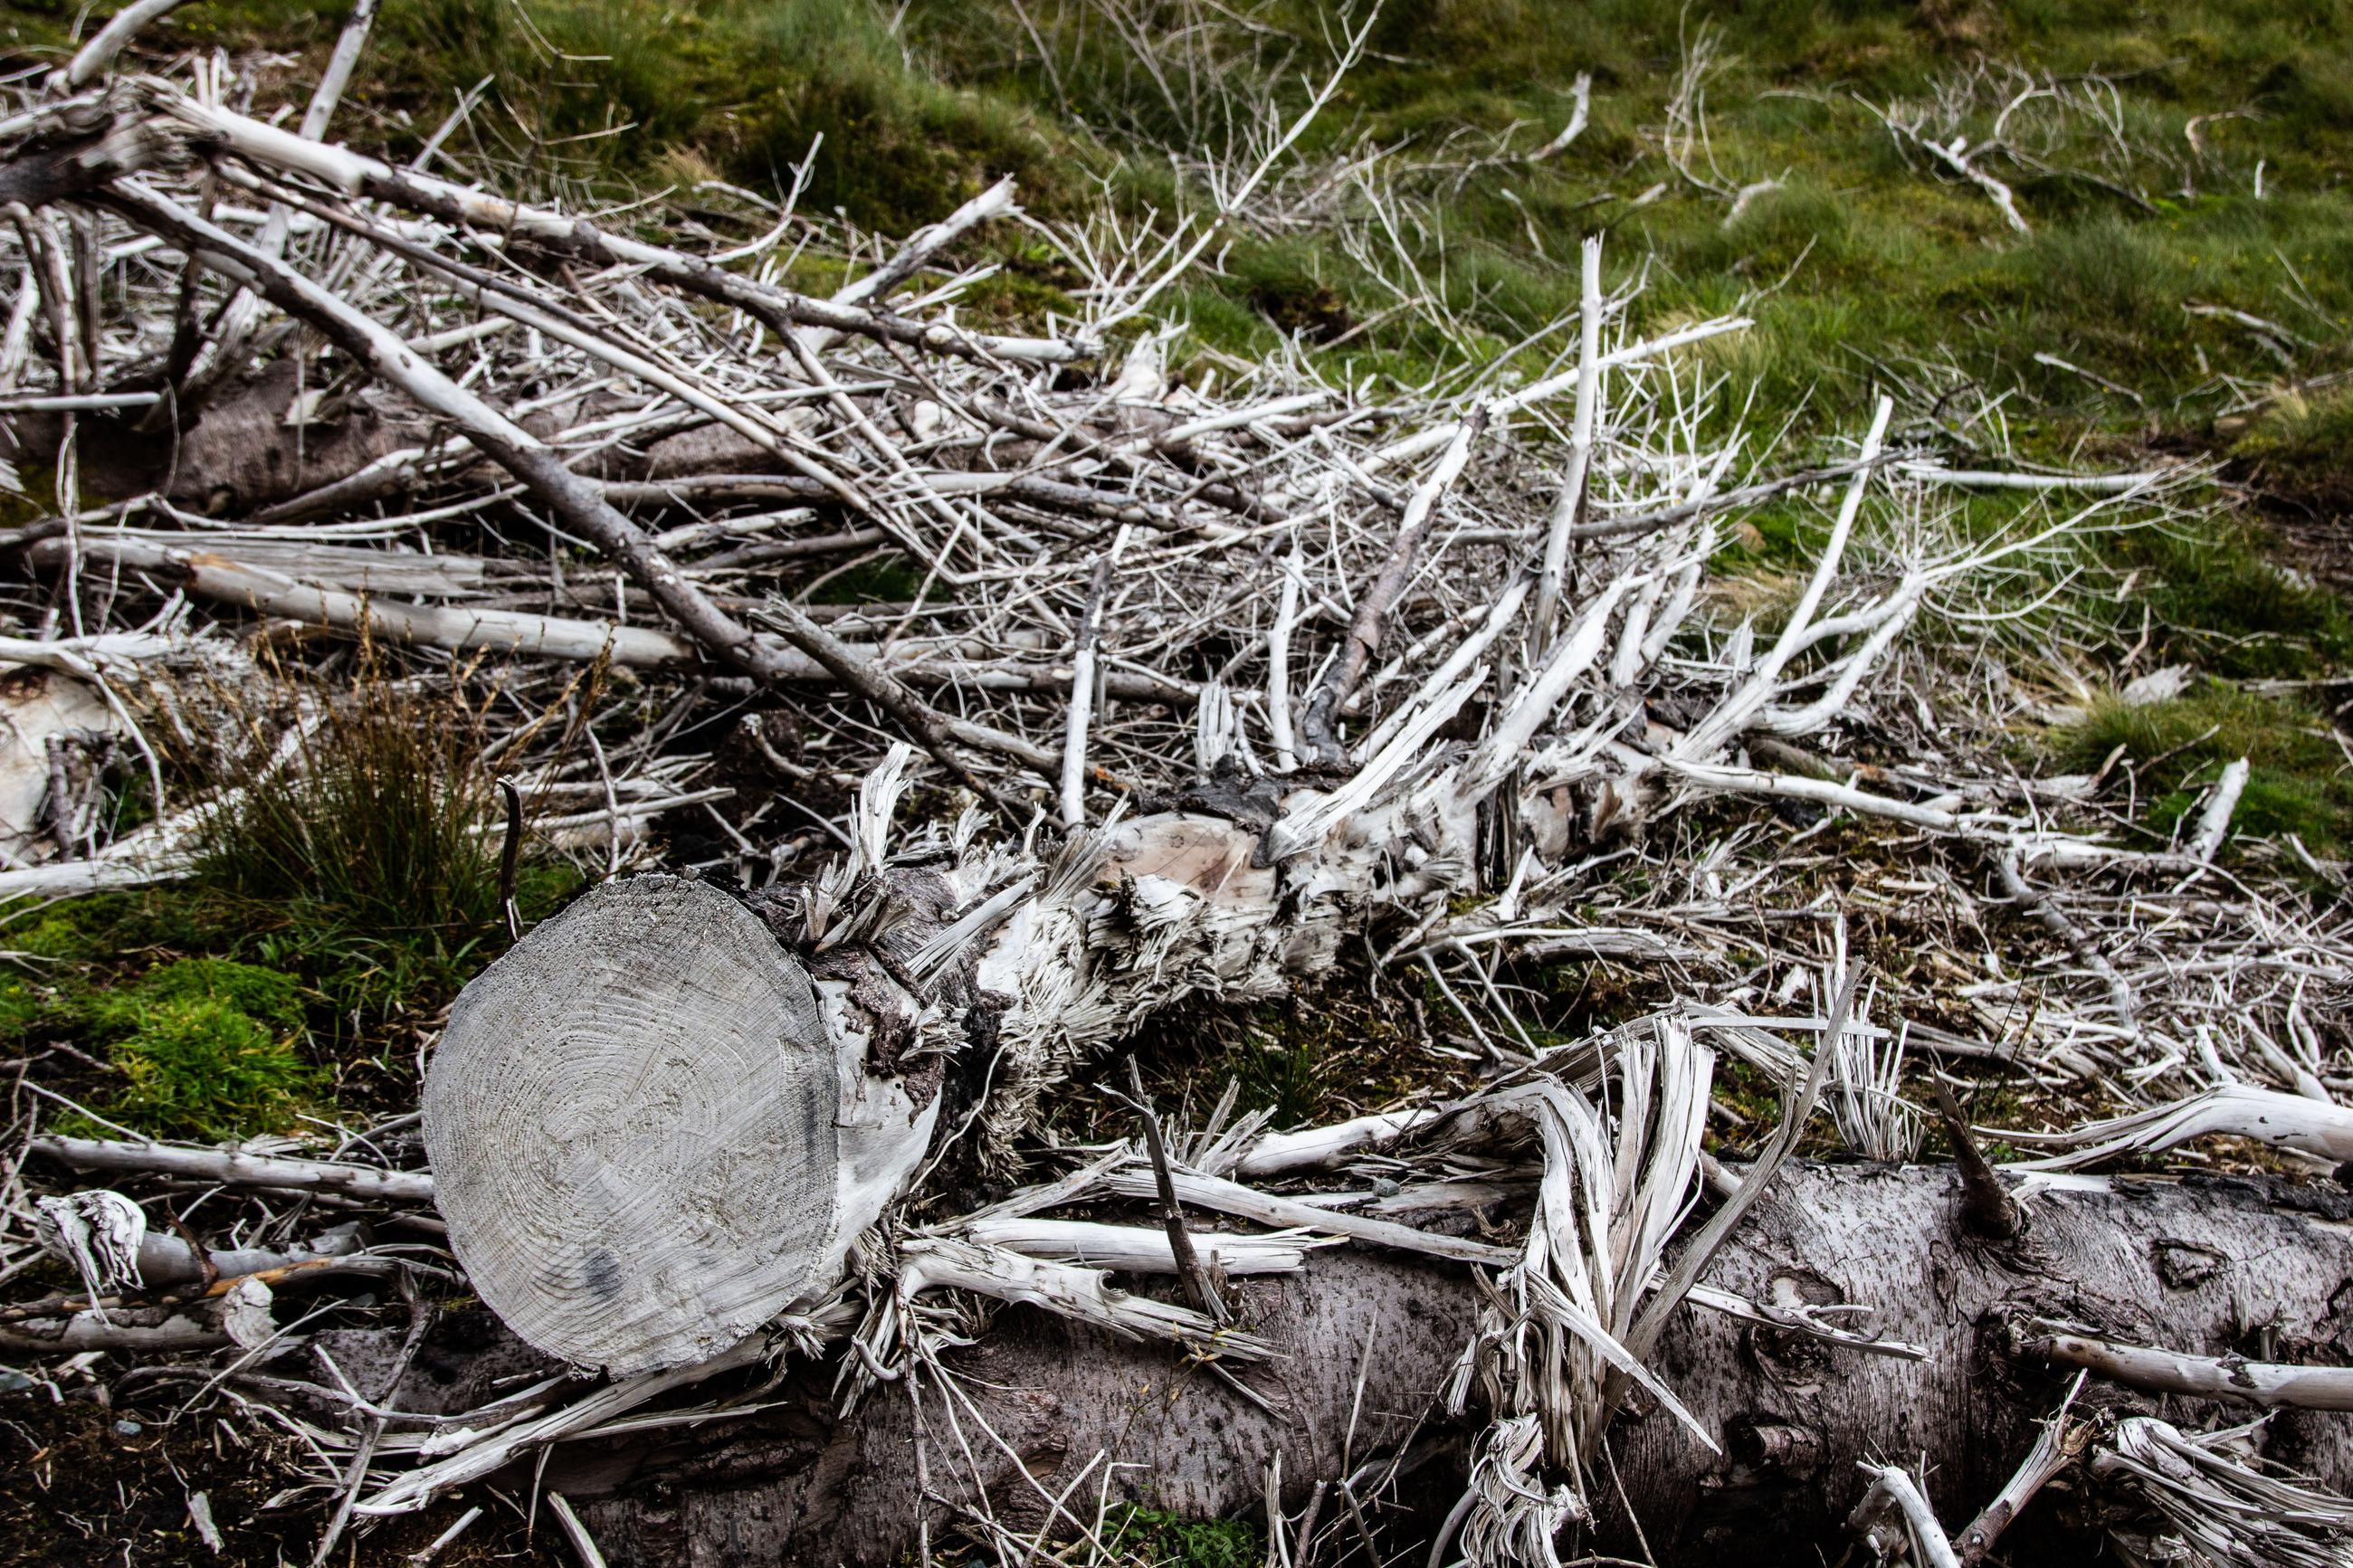 CLOSE-UP OF DEAD TREE IN FIELD